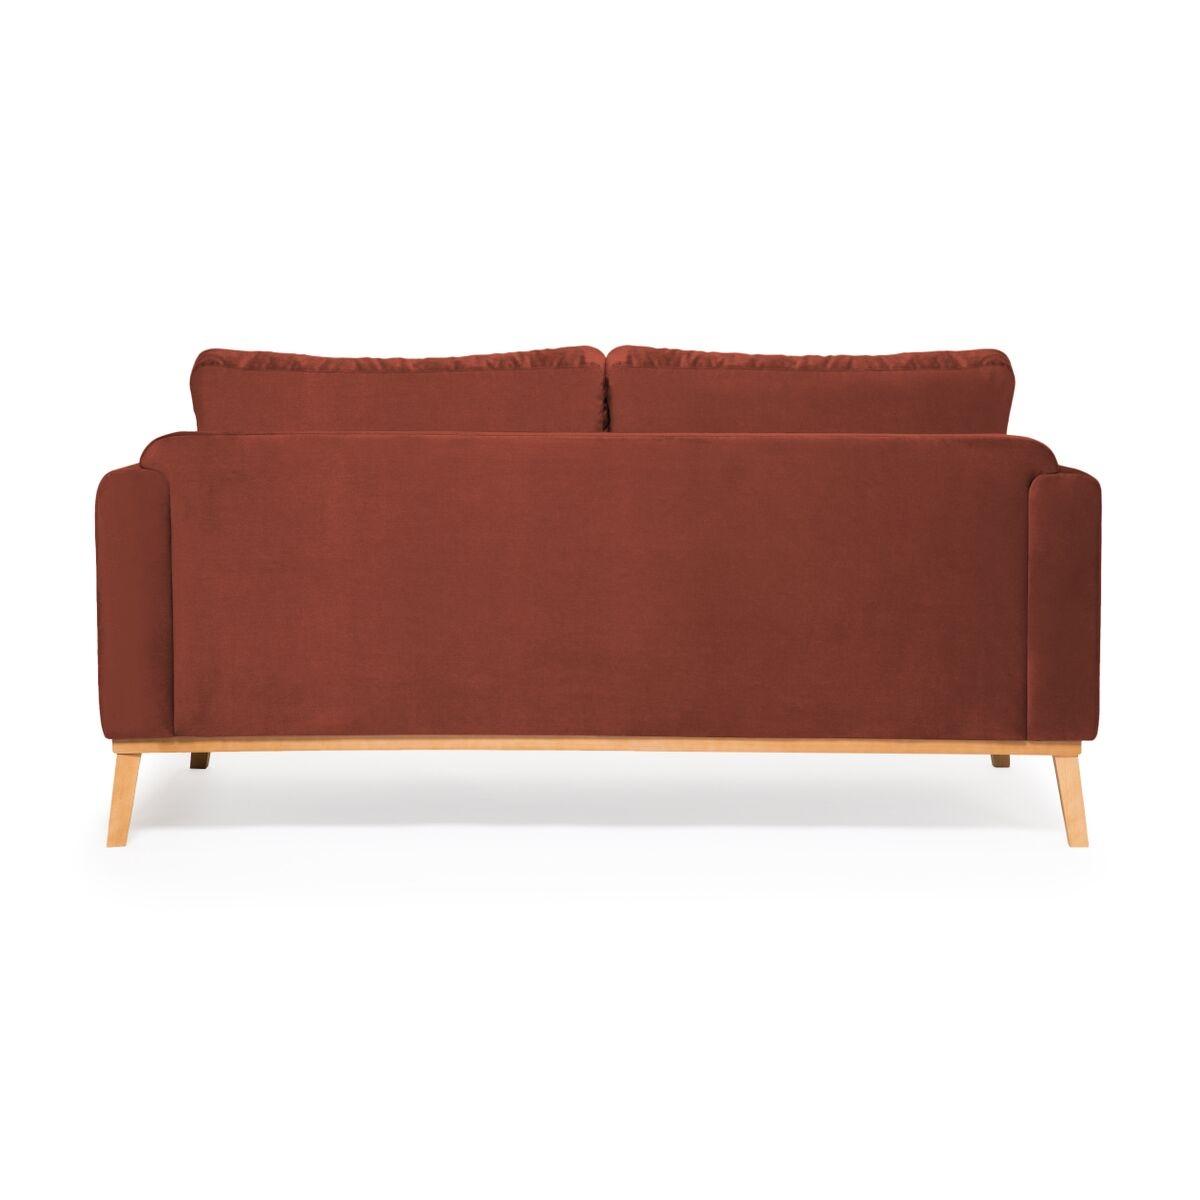 Canapea Fixa 3 locuri Milton Trend Marsala